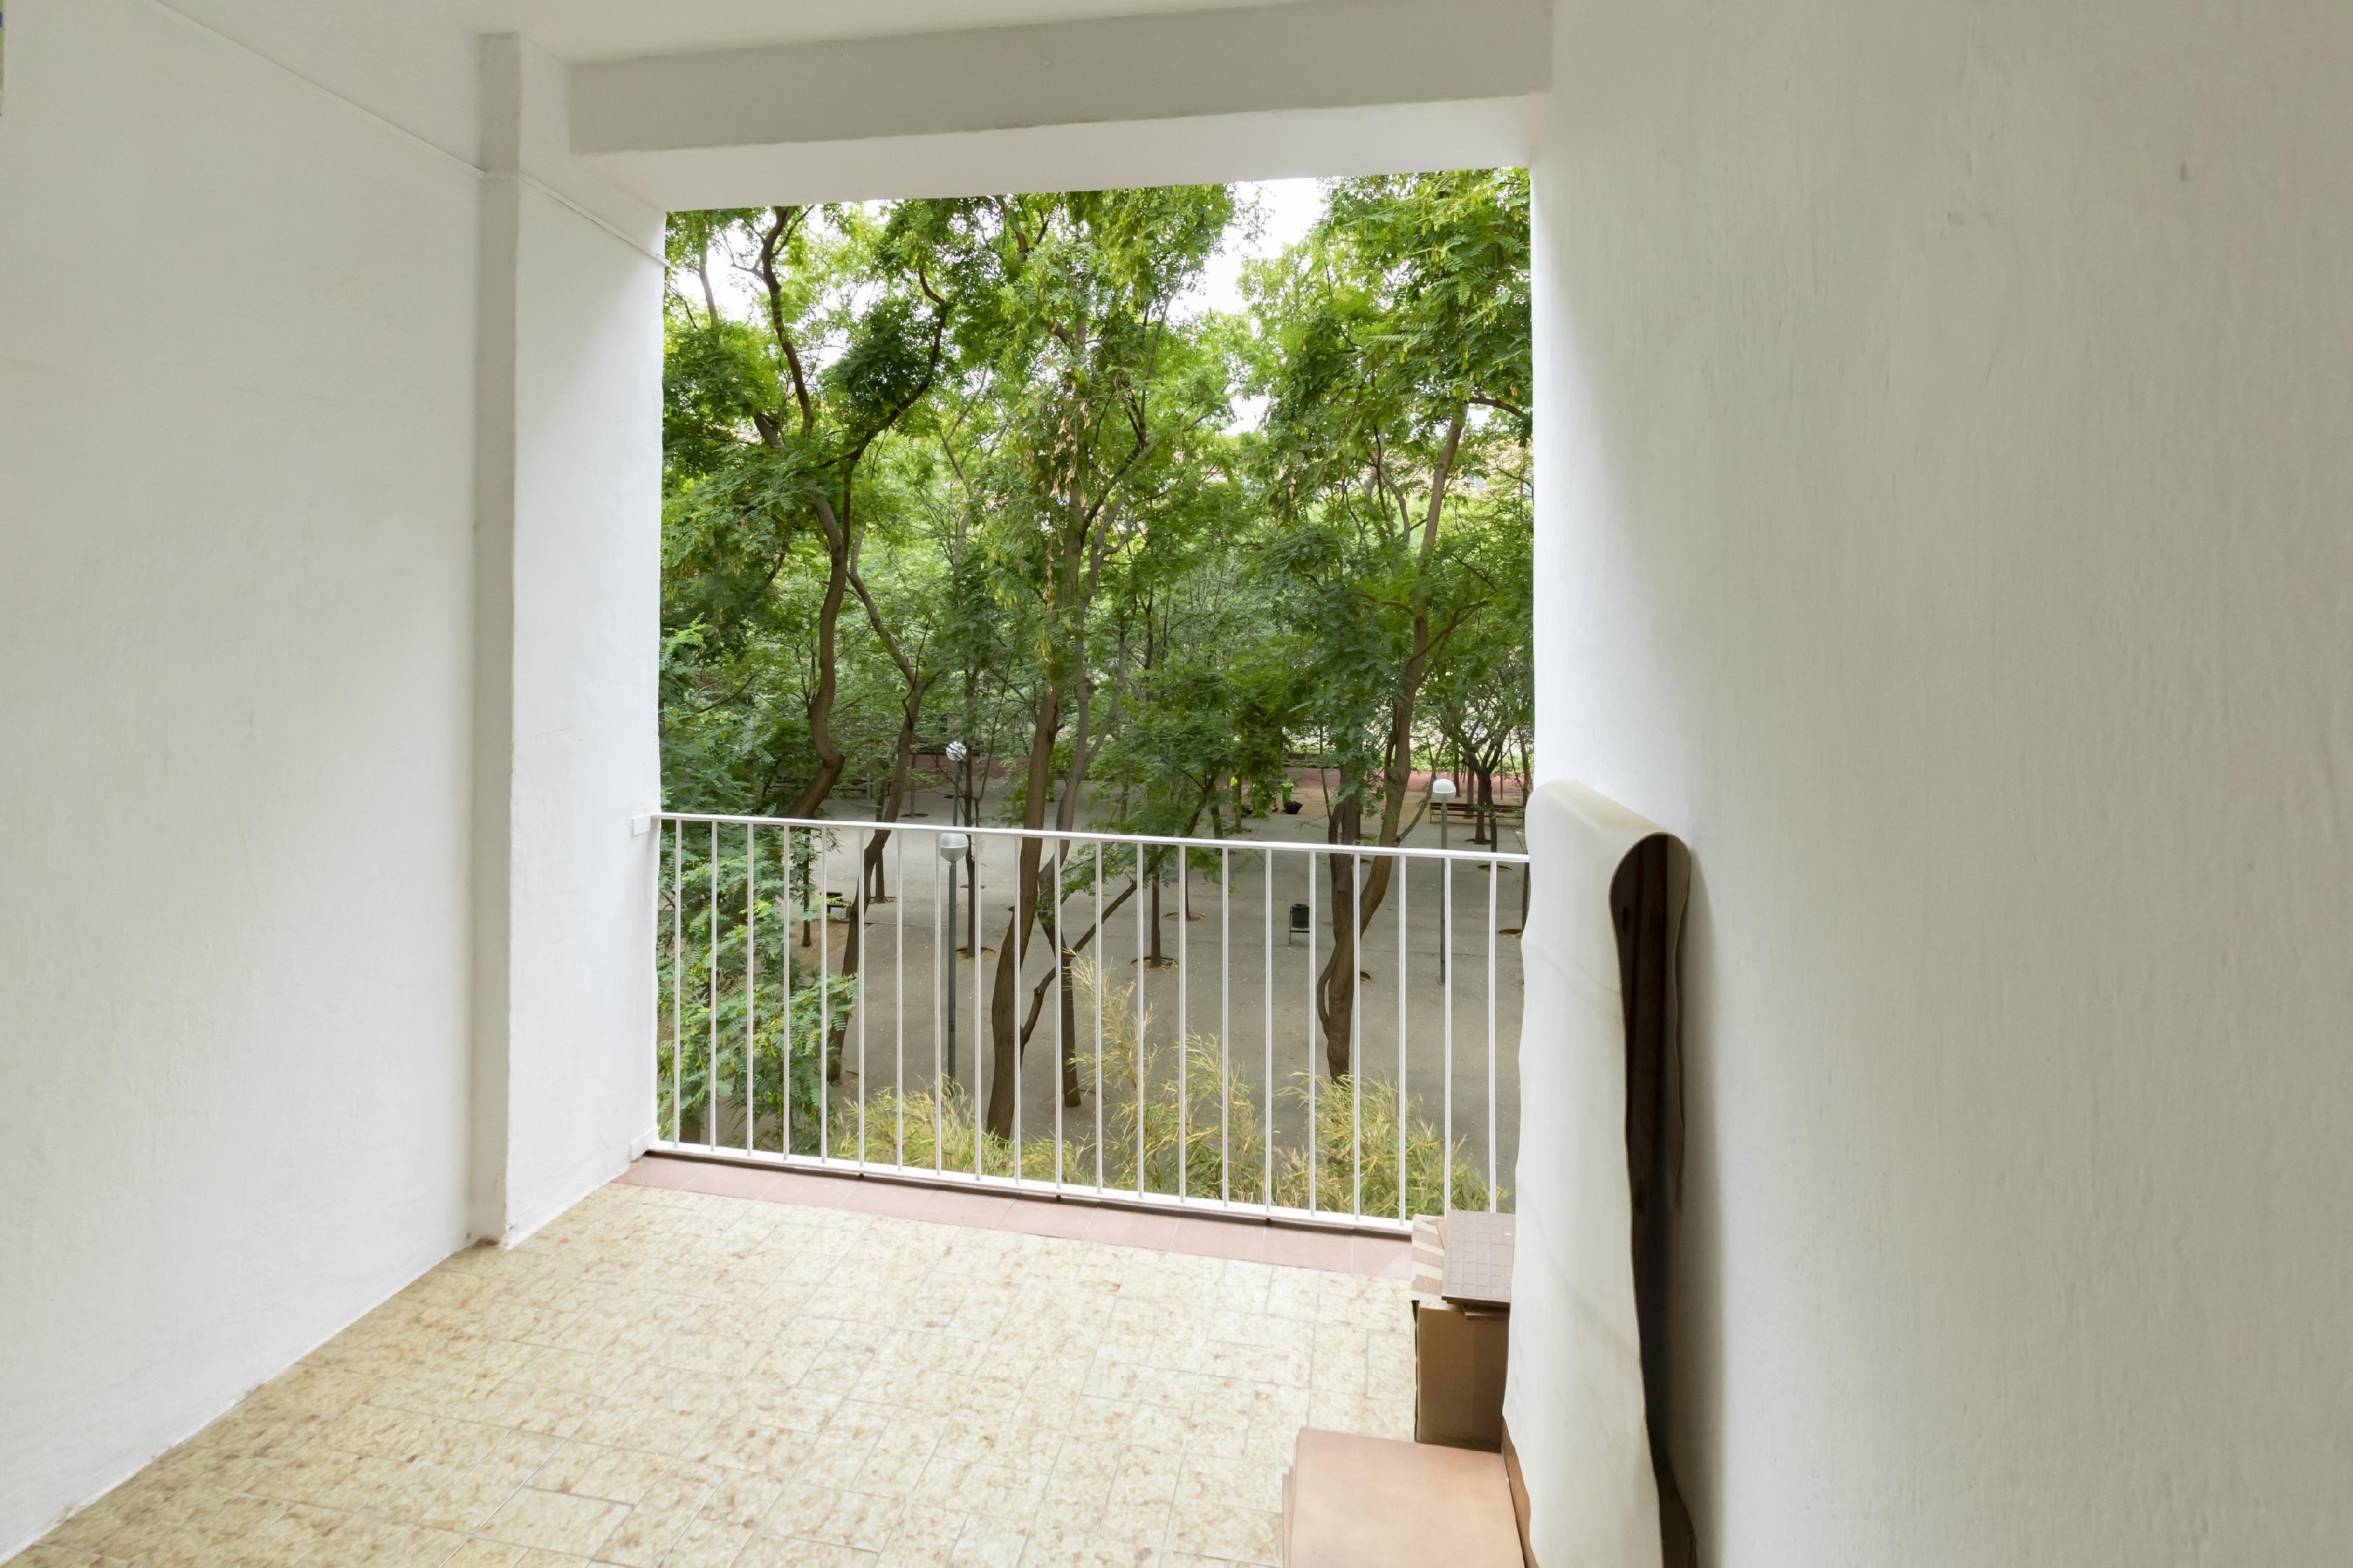 Imagen 1 Piso en venta en Barcelona / Rambla poblenou con Centro Comercial Les Gloríes